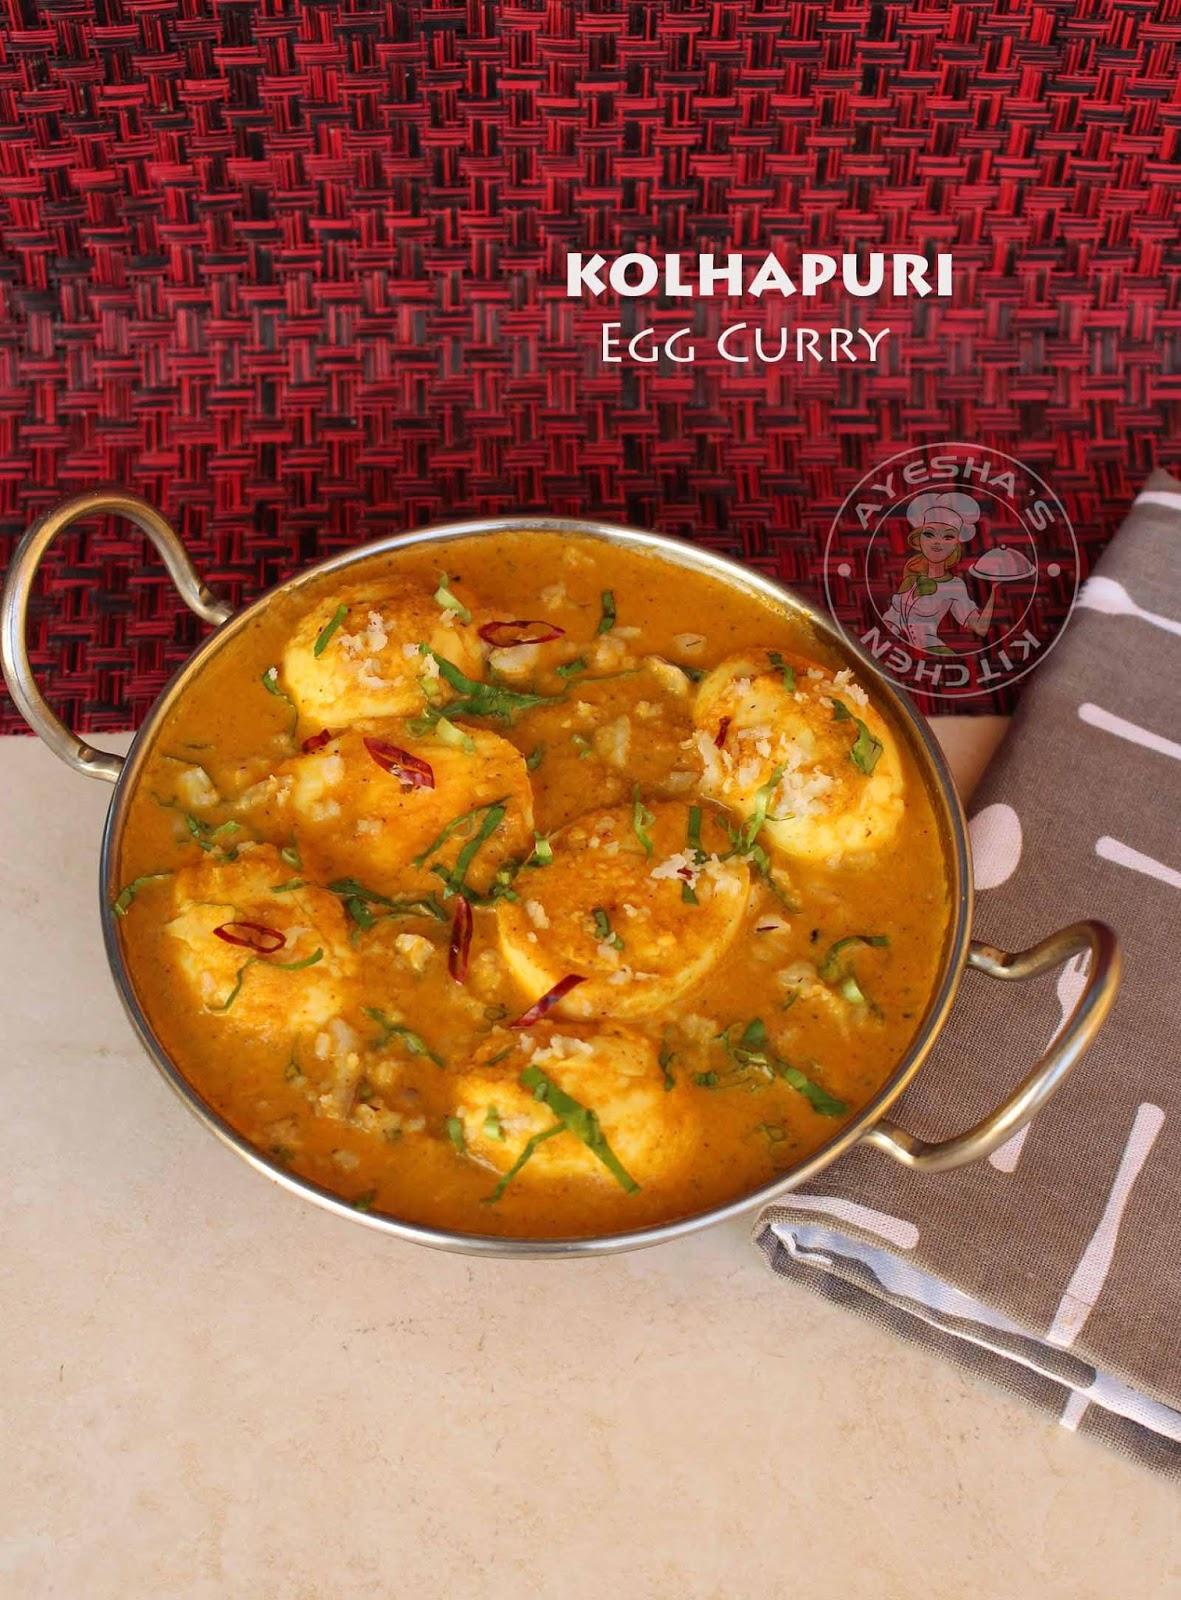 Simple egg recipes kolhapuri egg curry egg curry simple easy indian kerala style kolhapuri egg recipes boiled eggs for breakfast egg dishes forumfinder Images